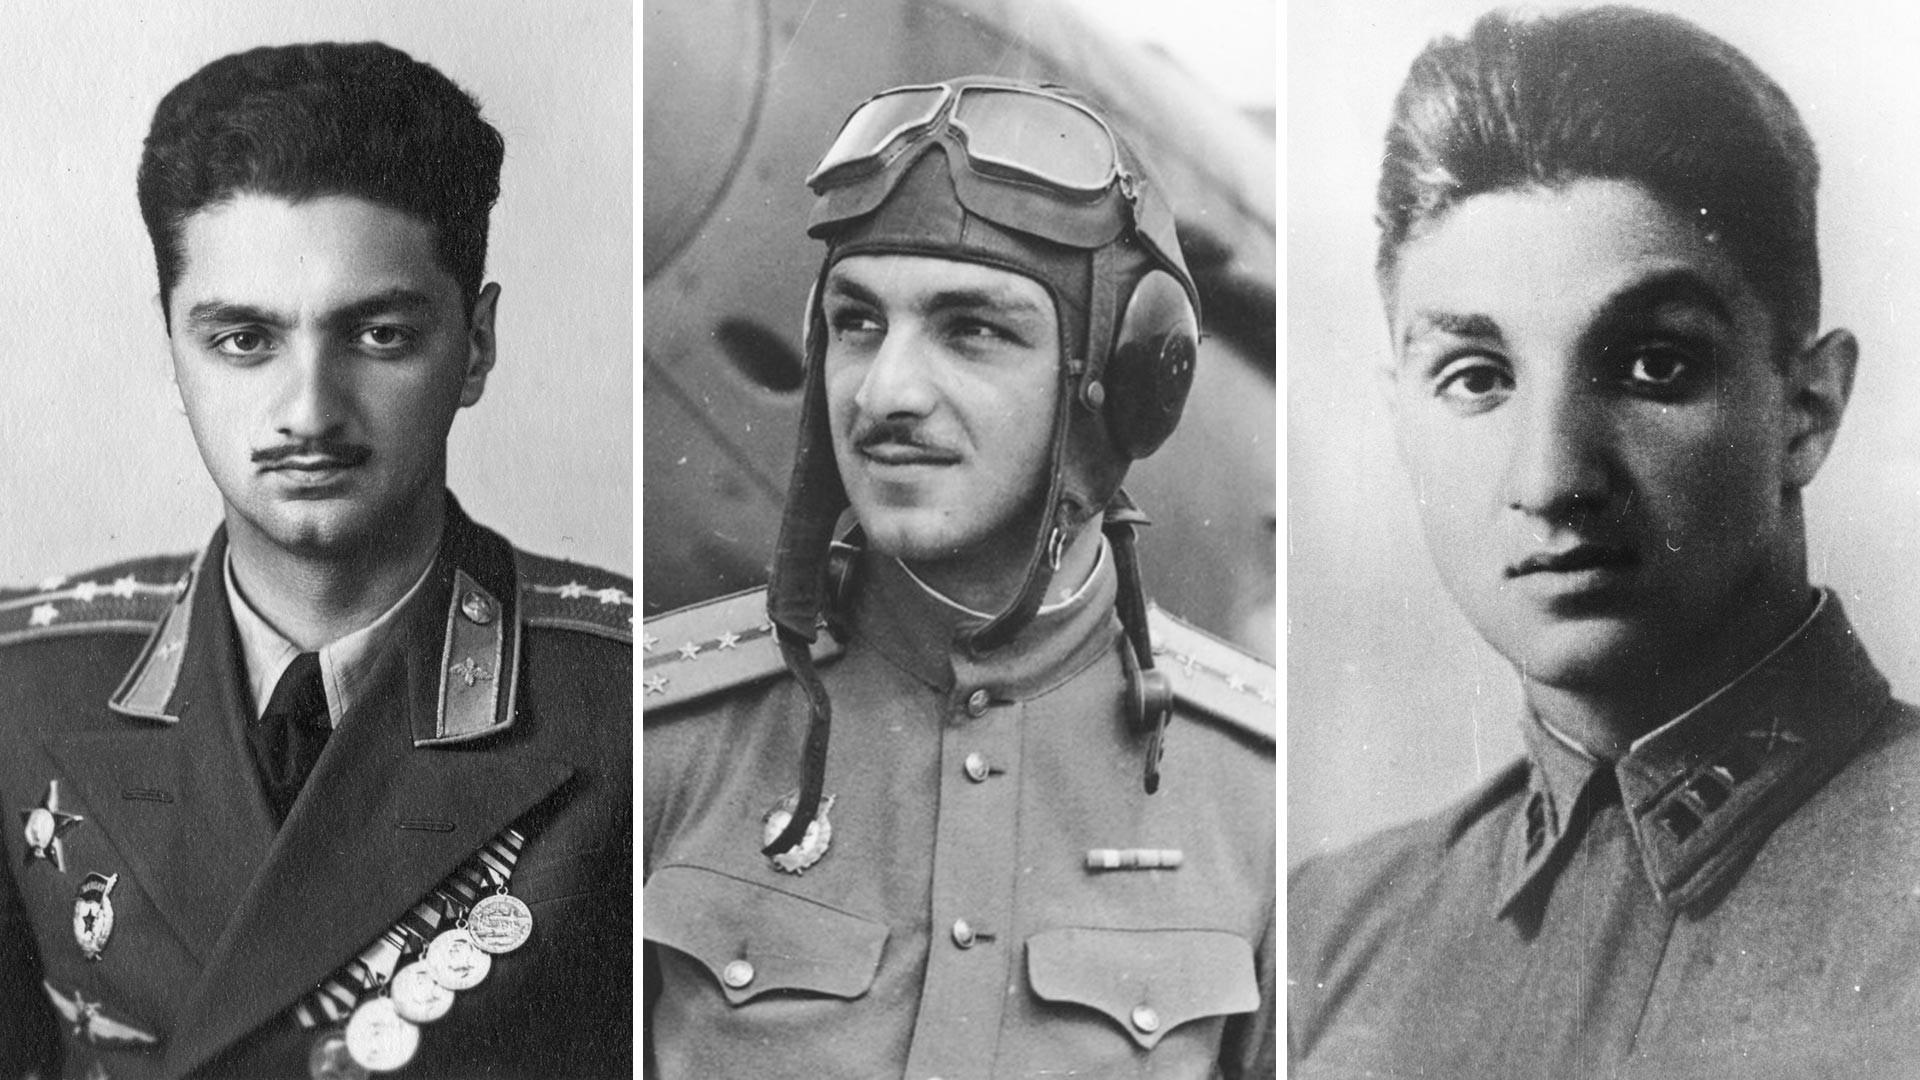 Алексей Микоян, Степан Микоян, Владимир Микоян.